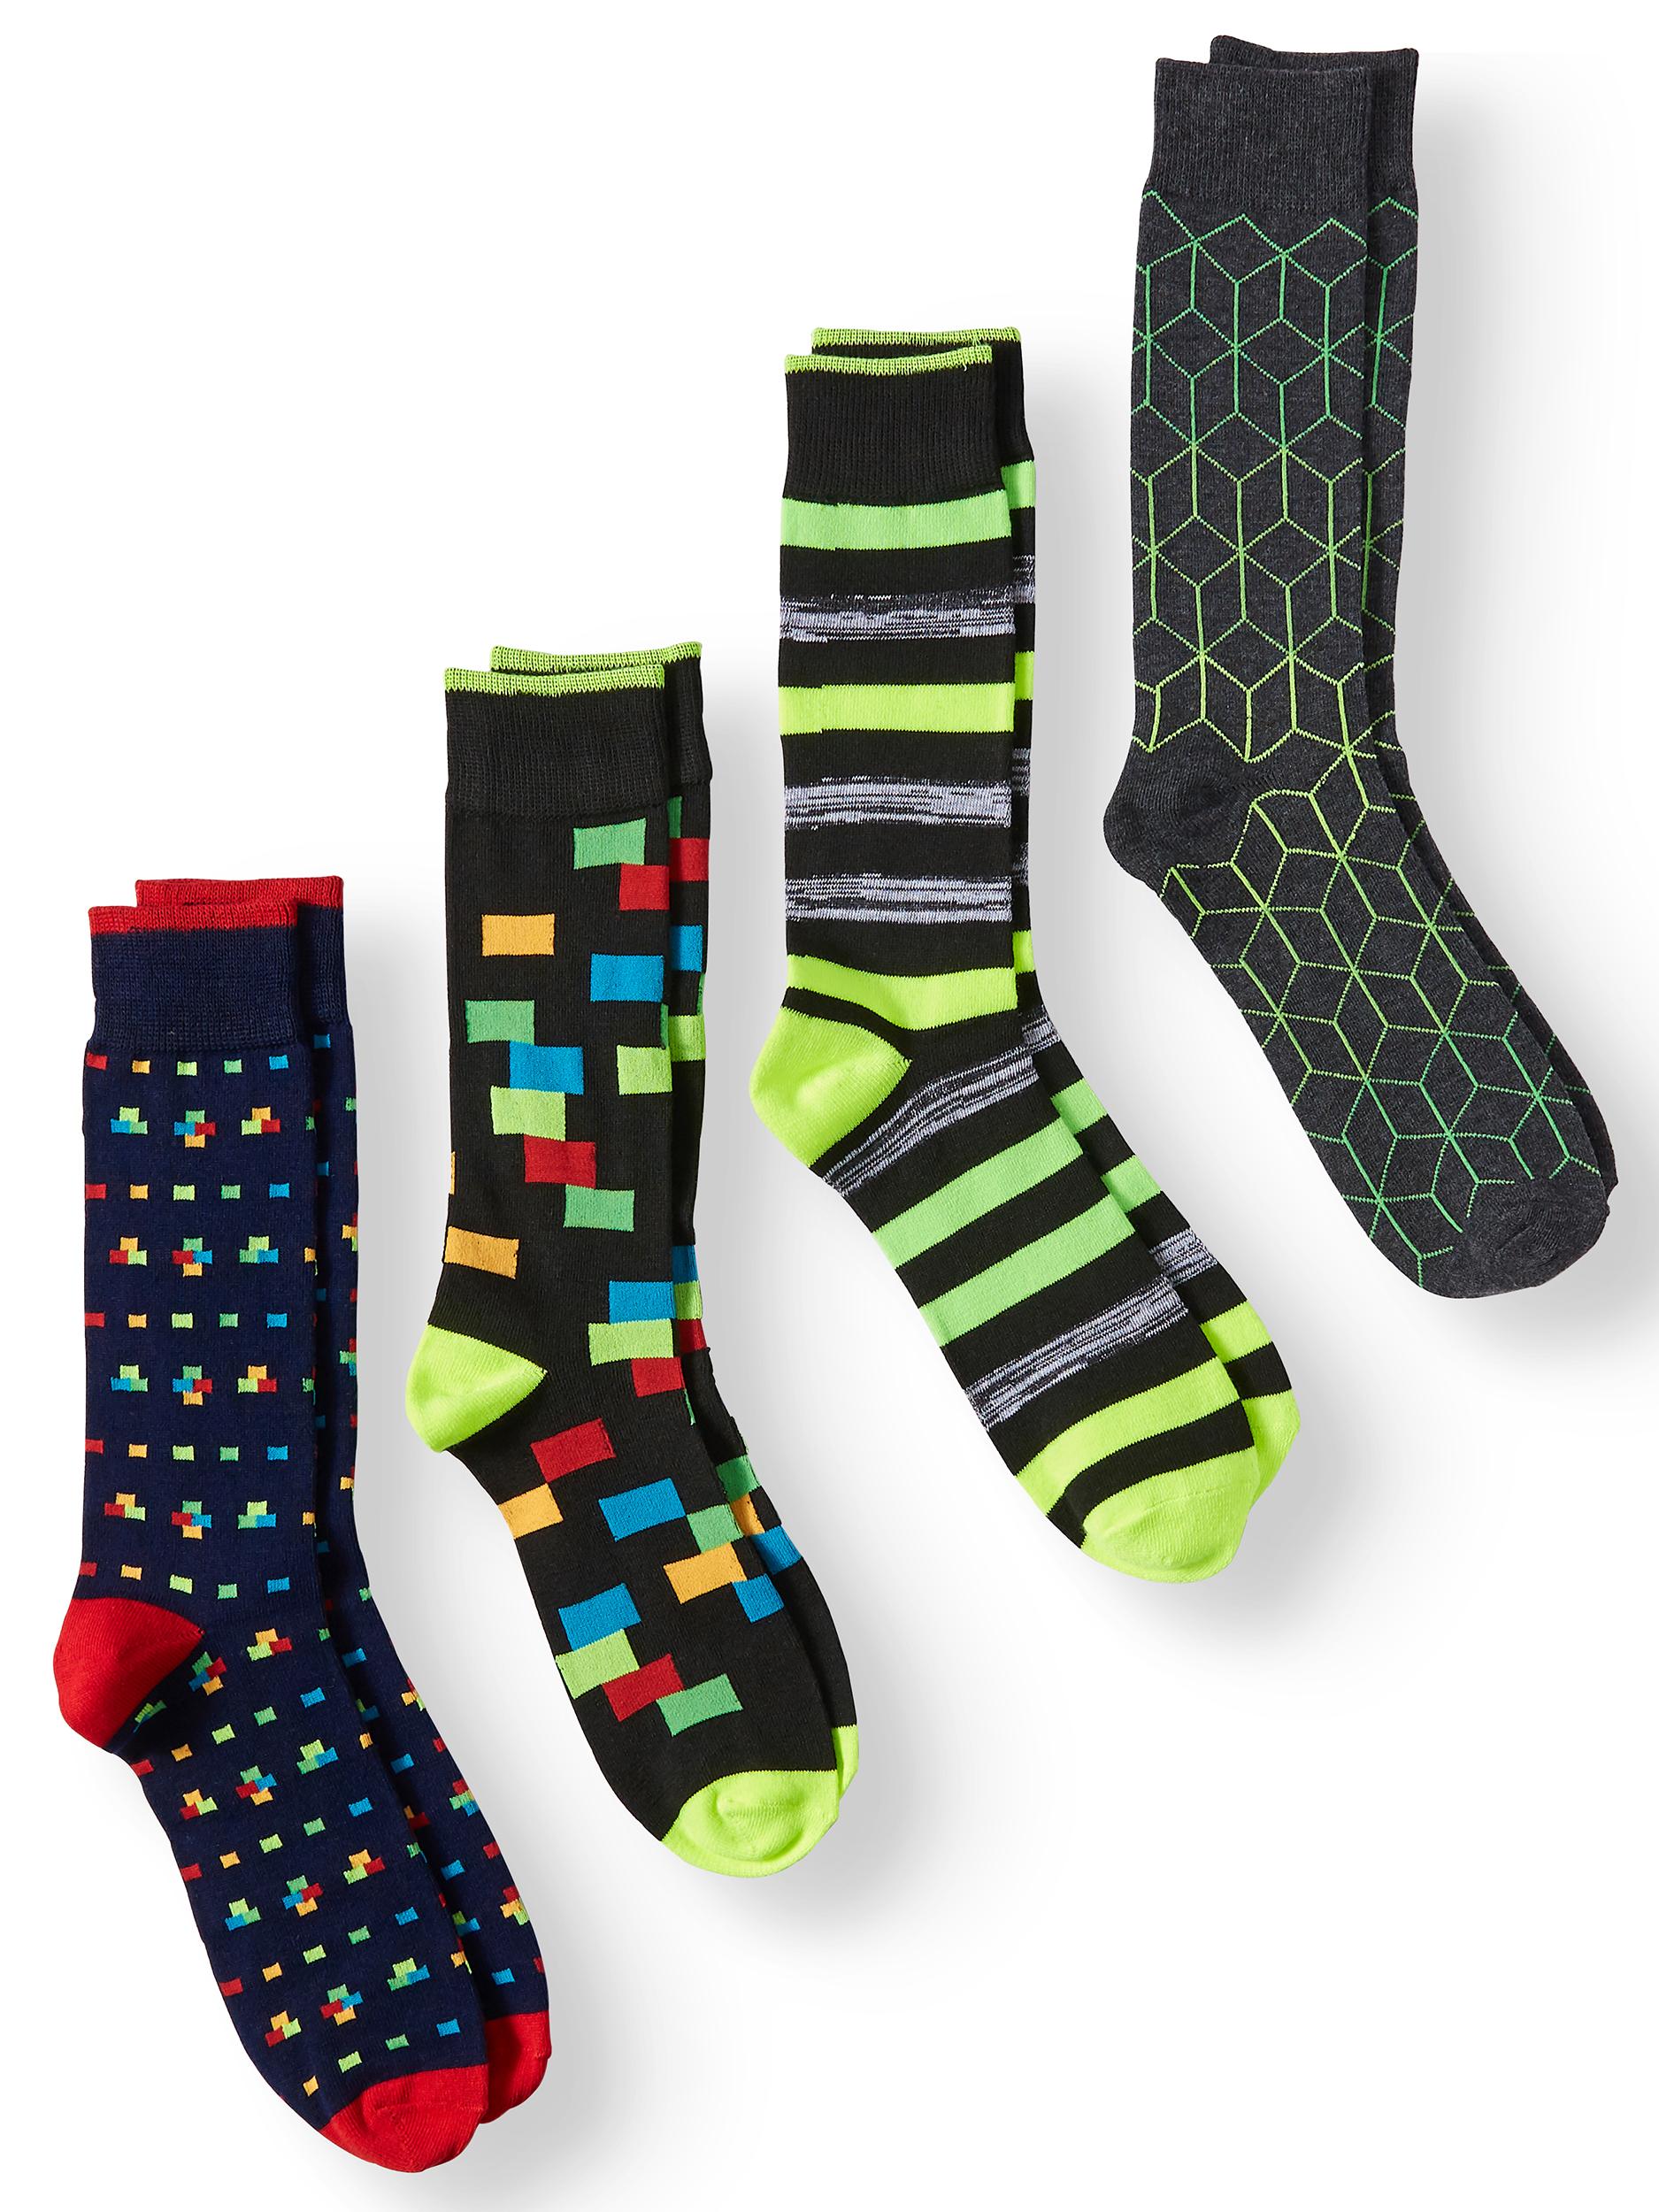 Socks, Rugby Stripe Crew